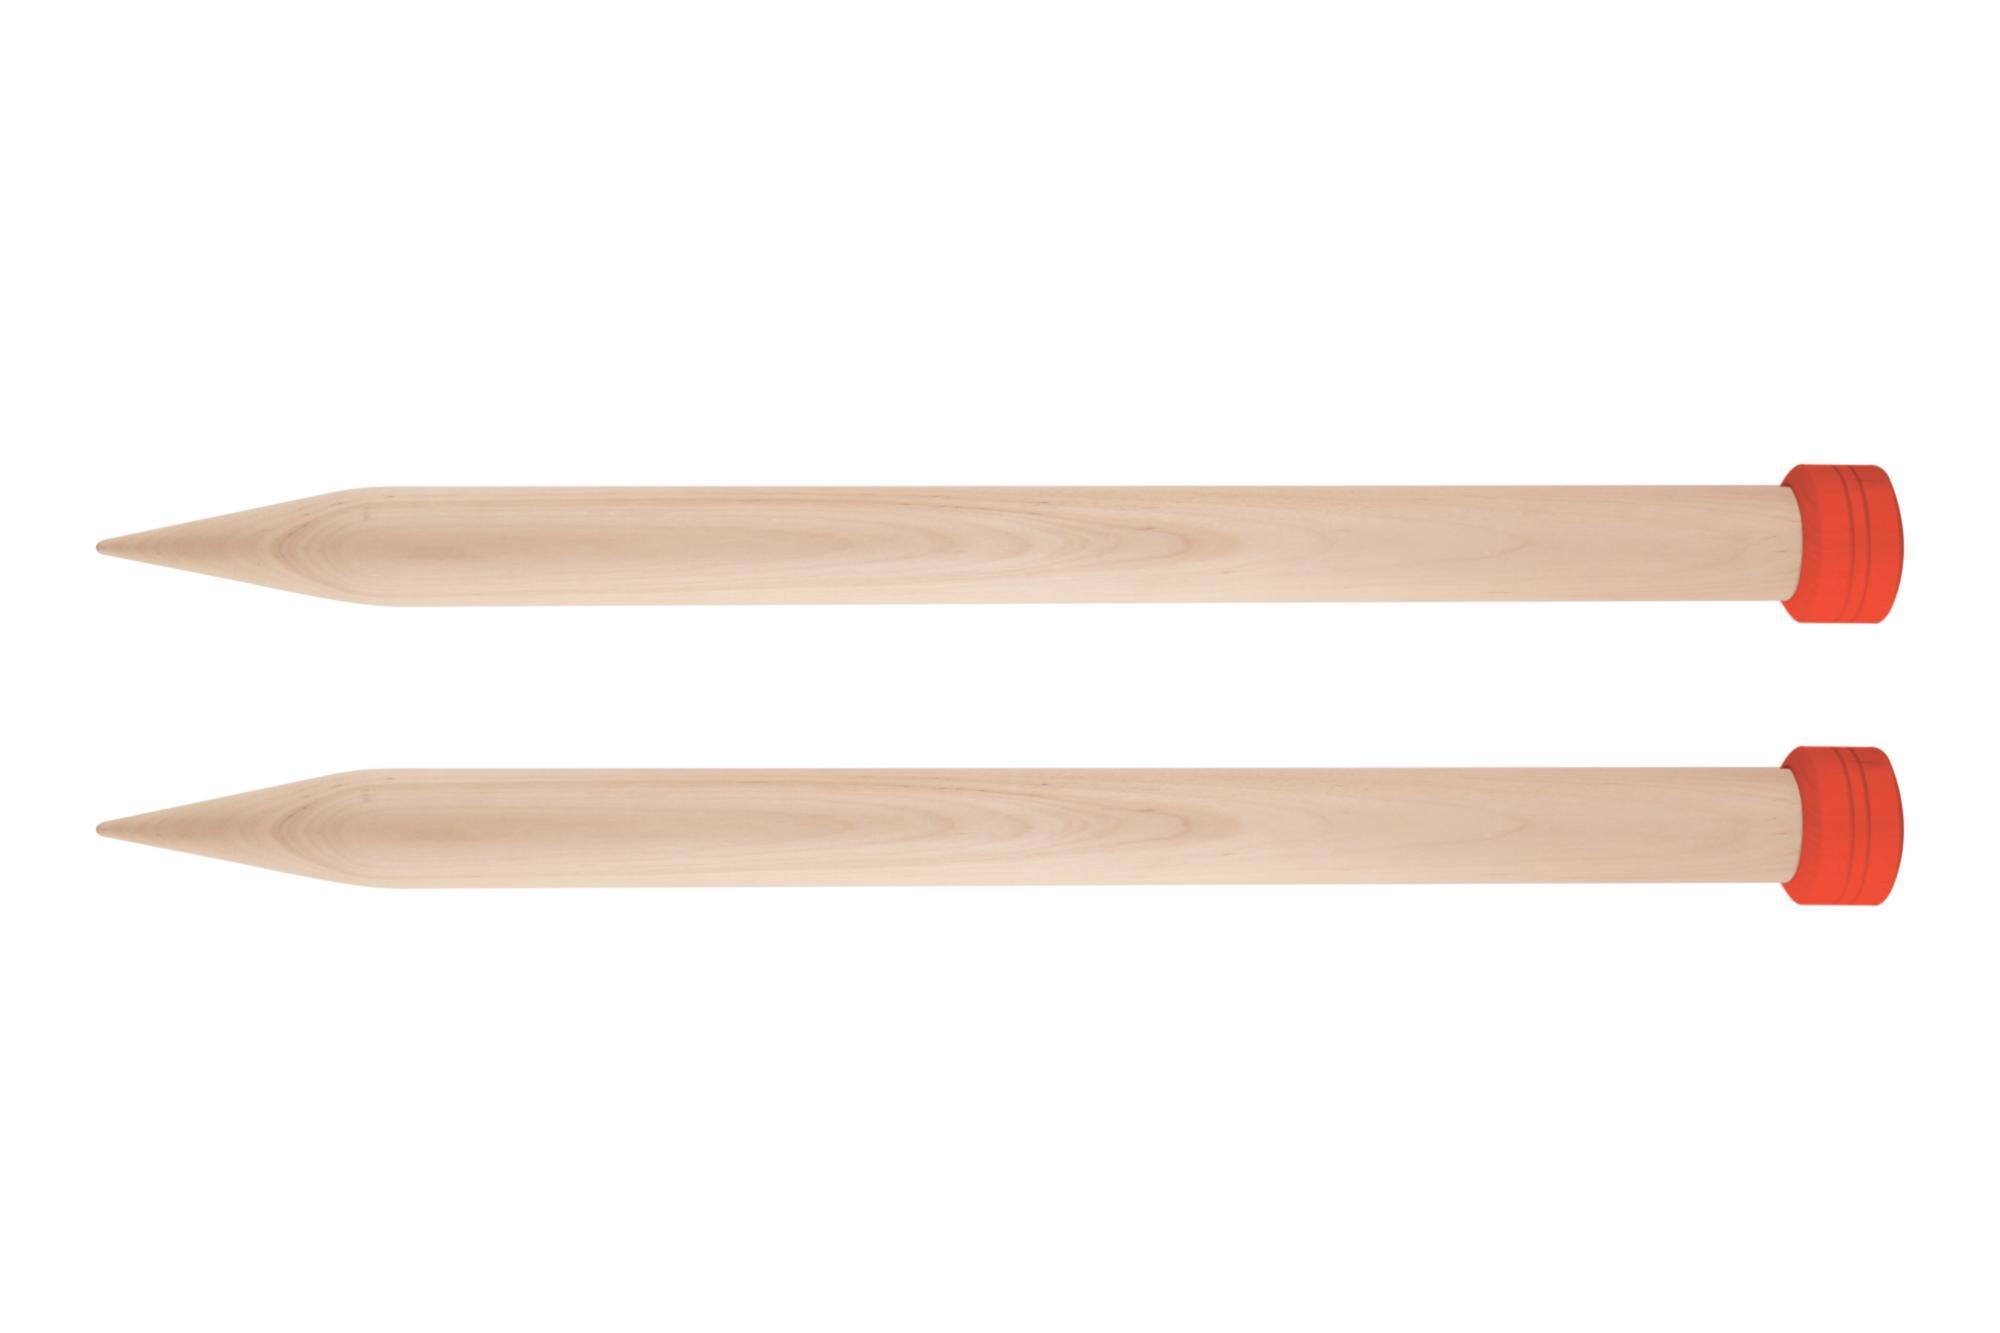 Спицы прямые 35 см Jumbo Birch KnitPro, 35271, 25.00 мм